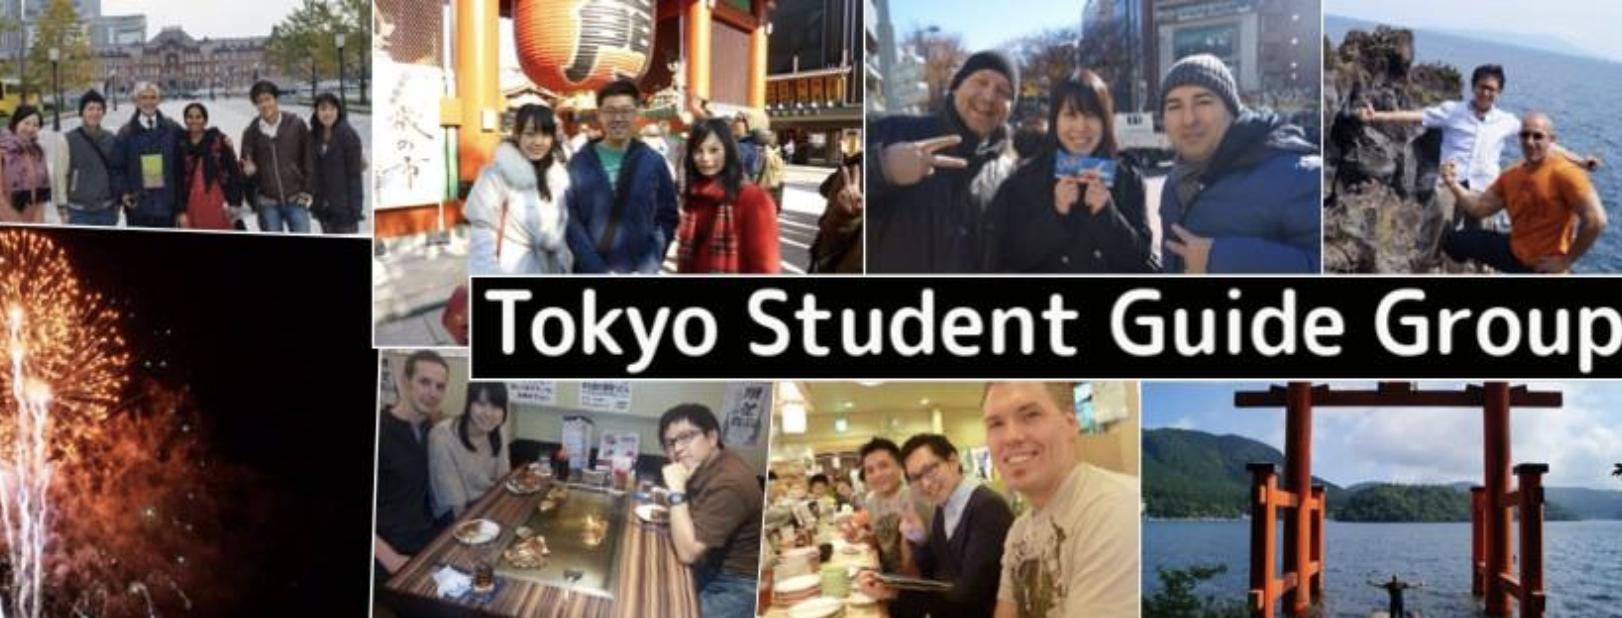 free tokyo tour guide